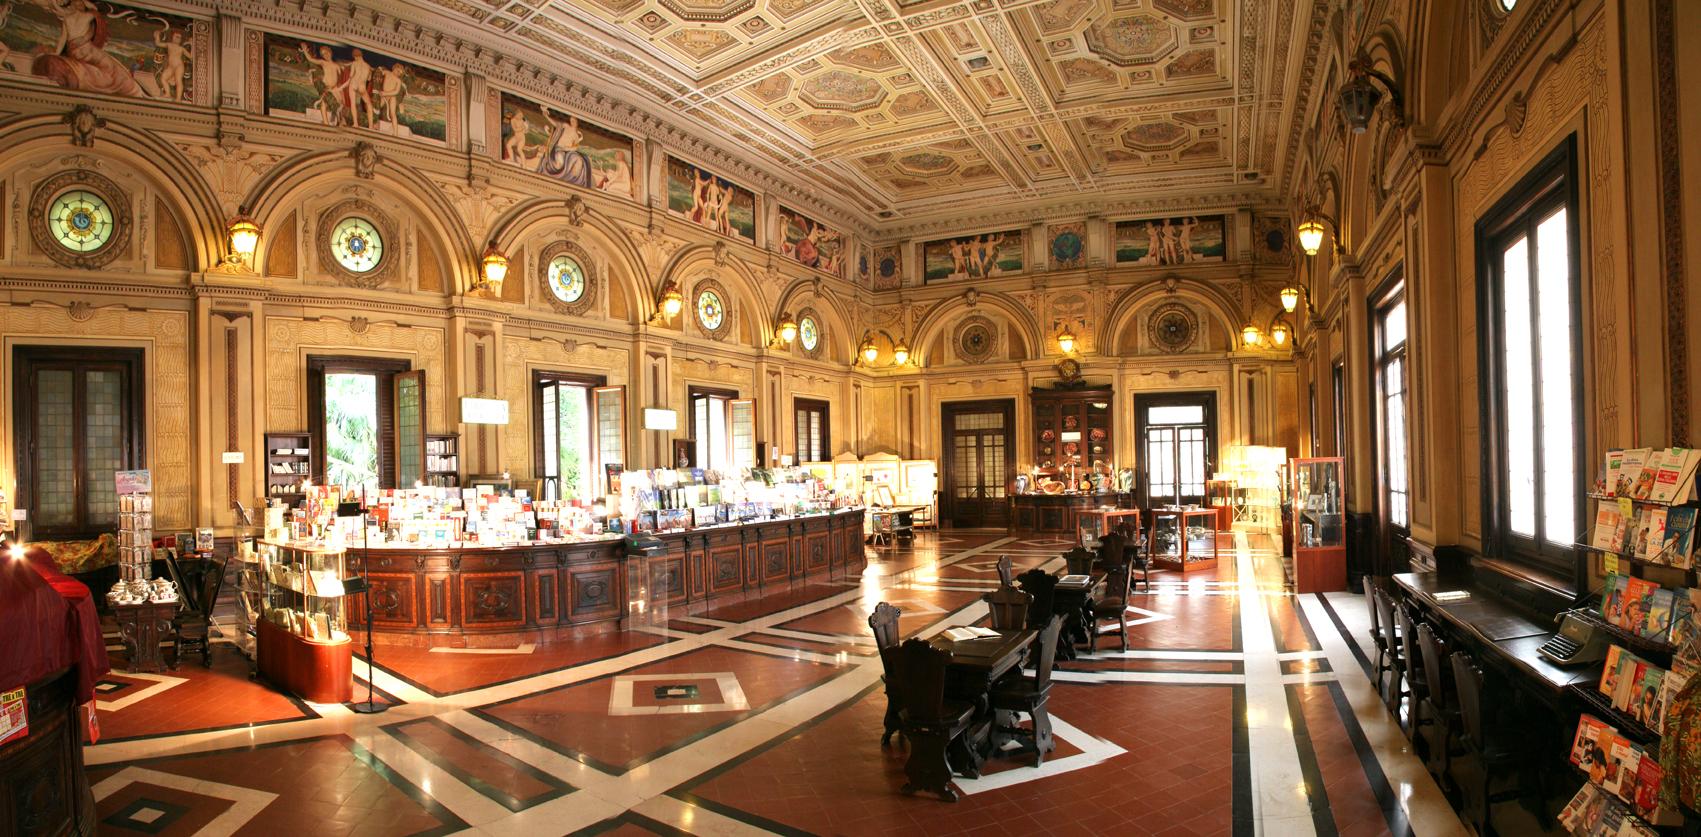 Hotel Spa Montecatini Terme